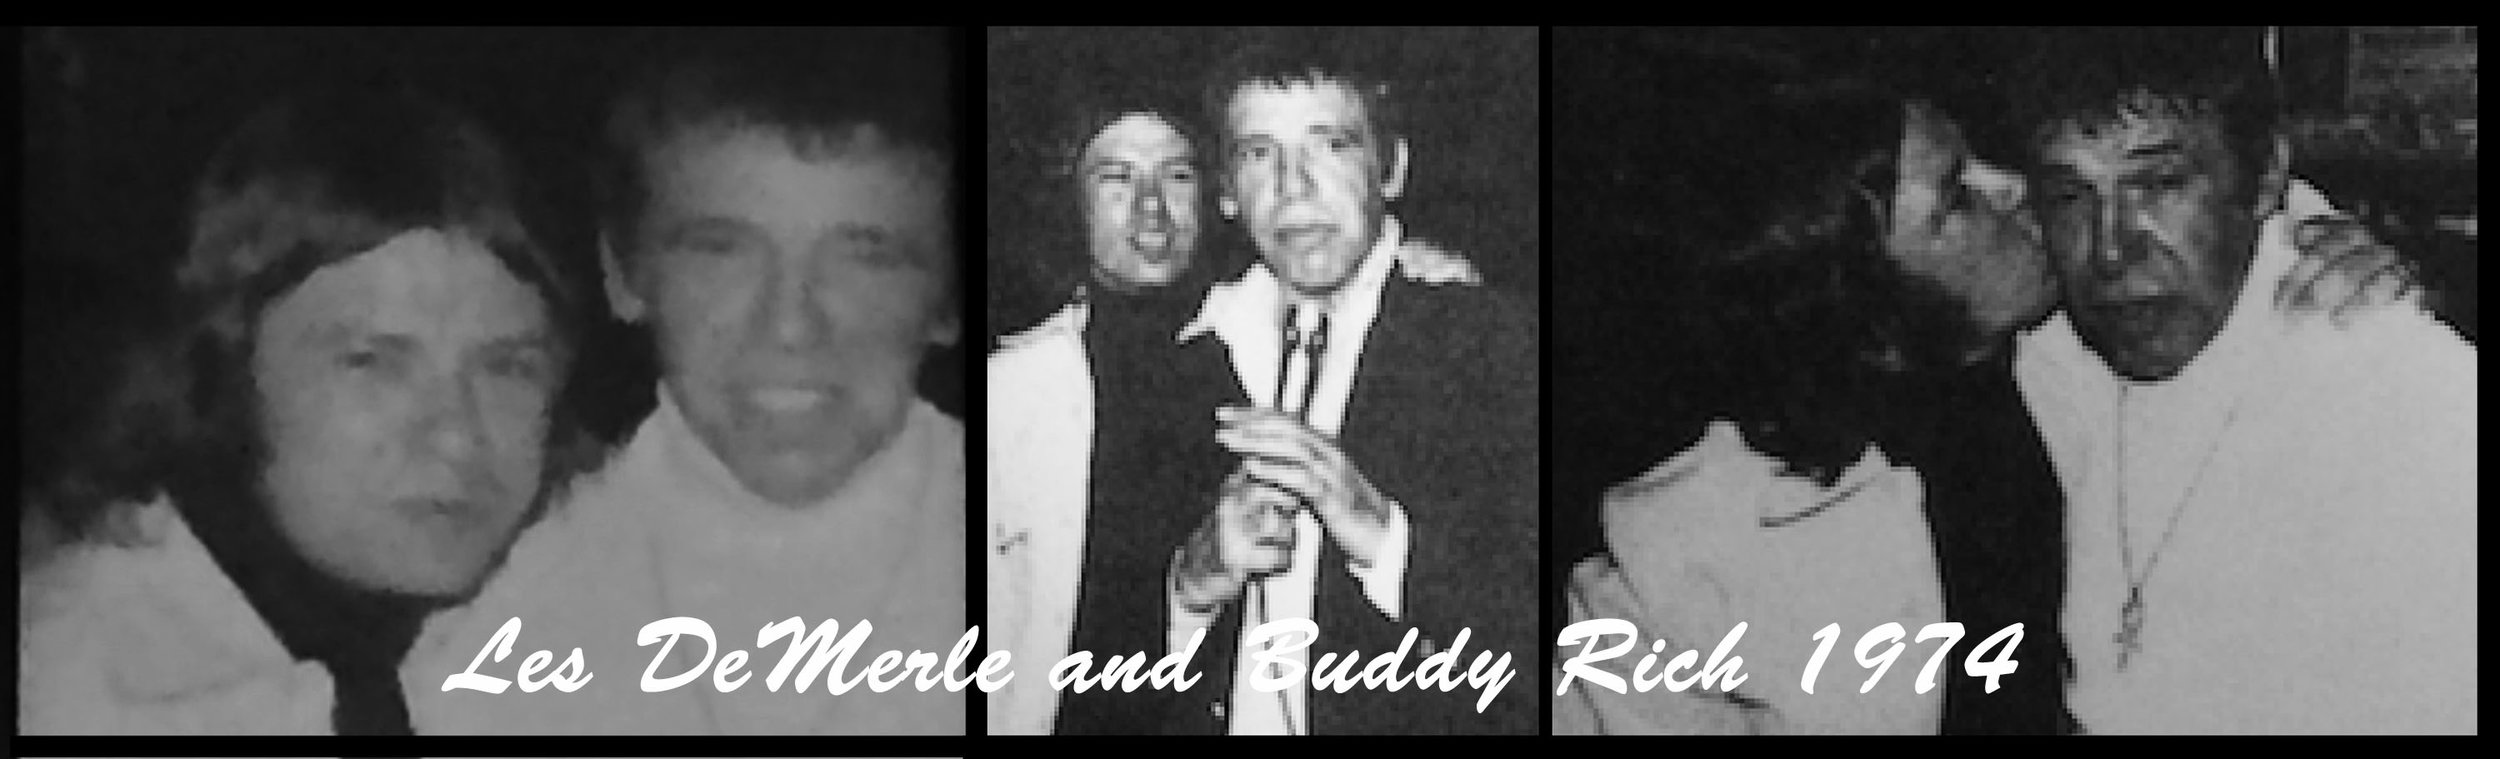 Les & Buddy-1974.jpg